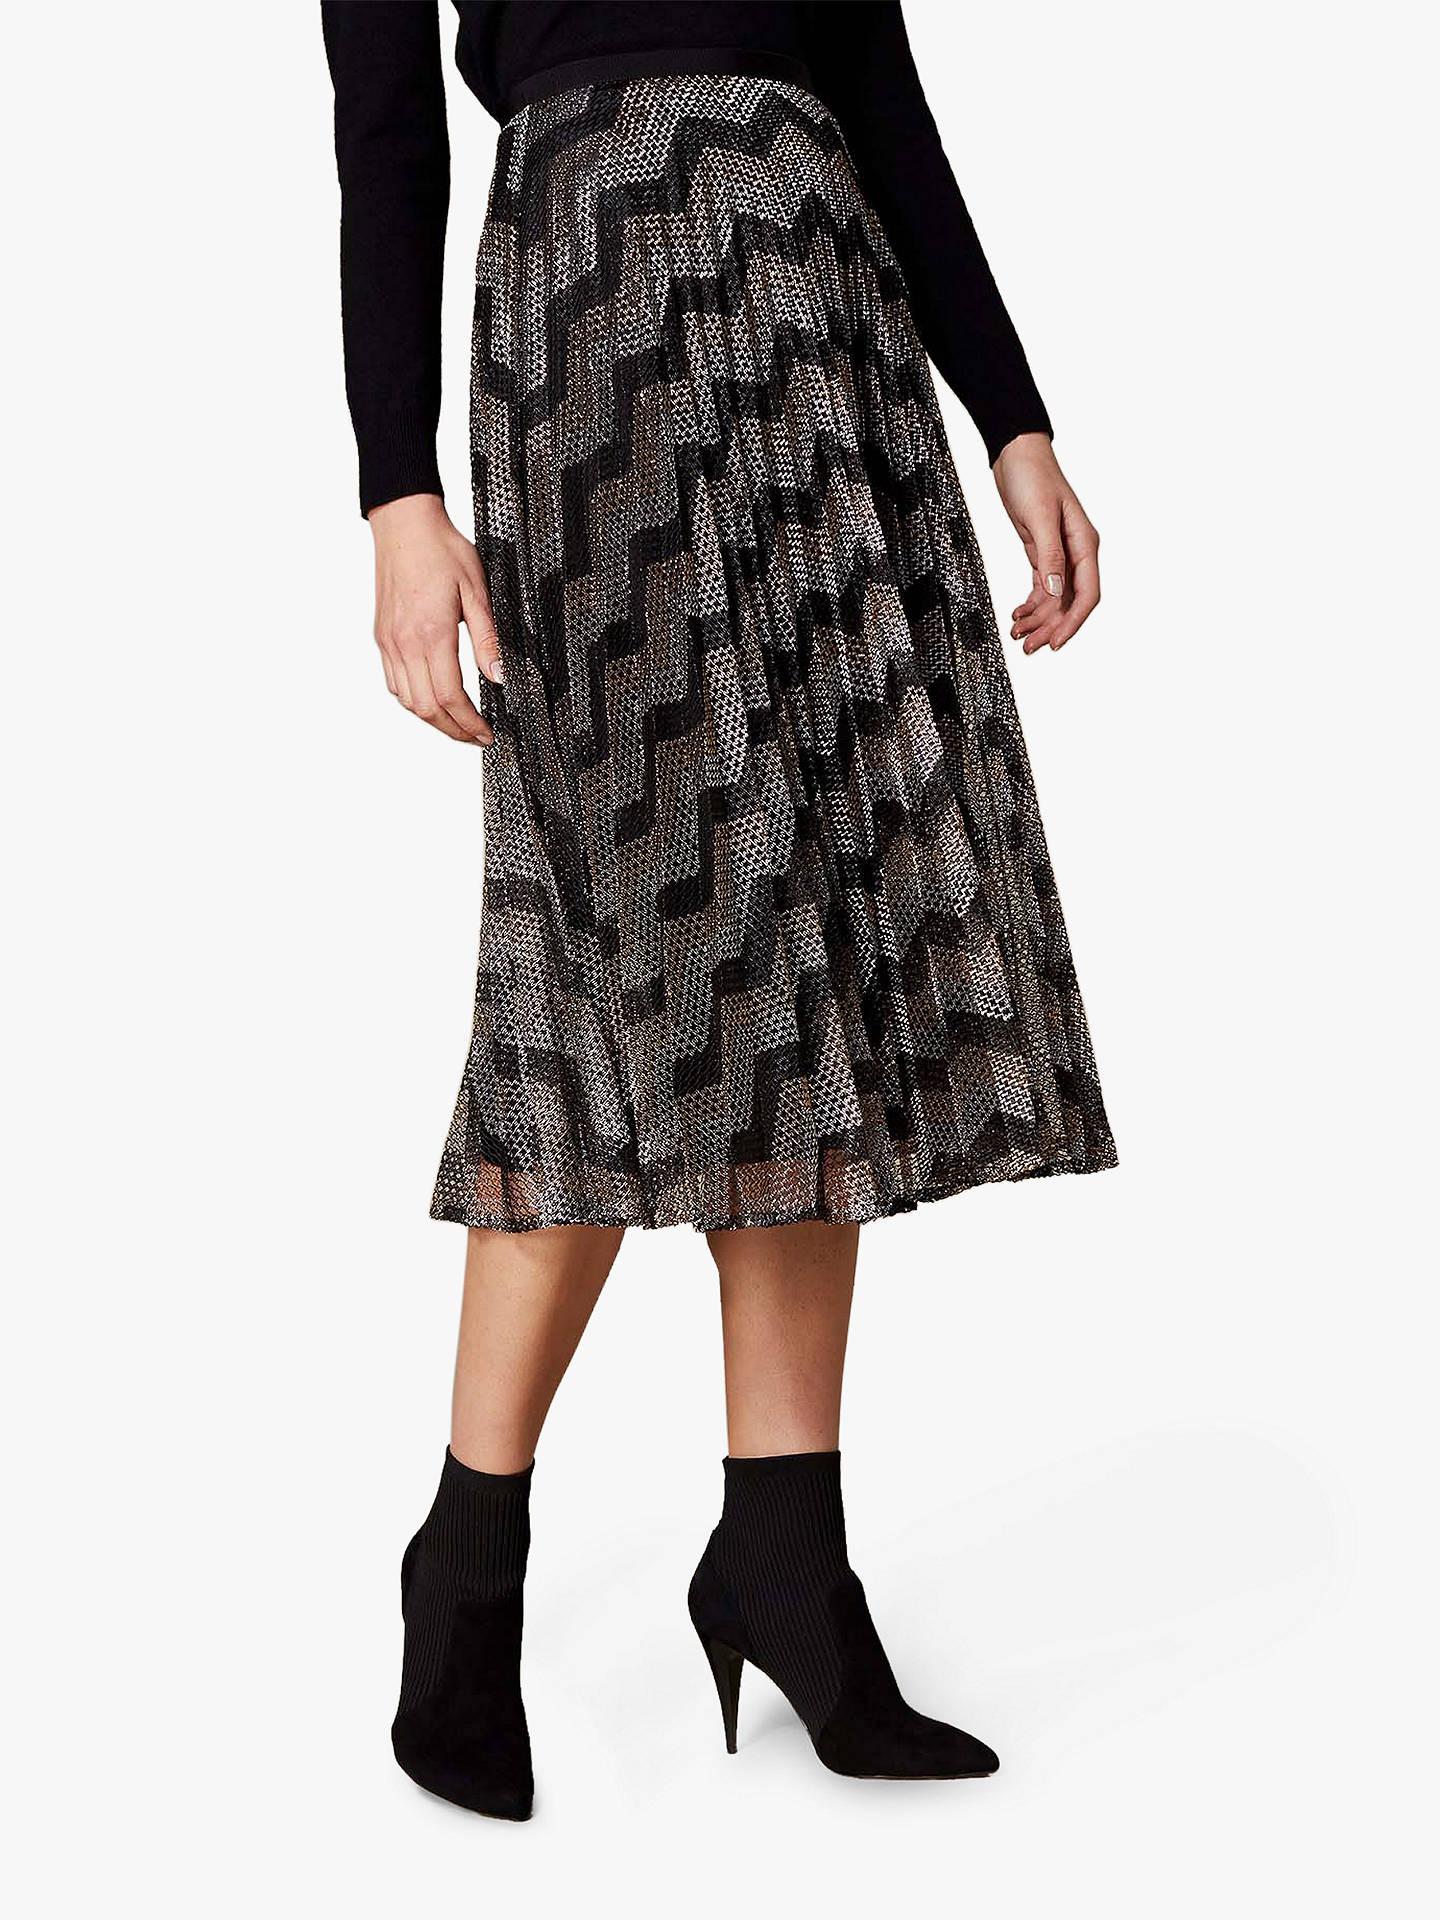 366cbda942b1c9 Buy Karen Millen Metallic Chevron Skirt, Multicolour, 12 Online at  johnlewis.com ...